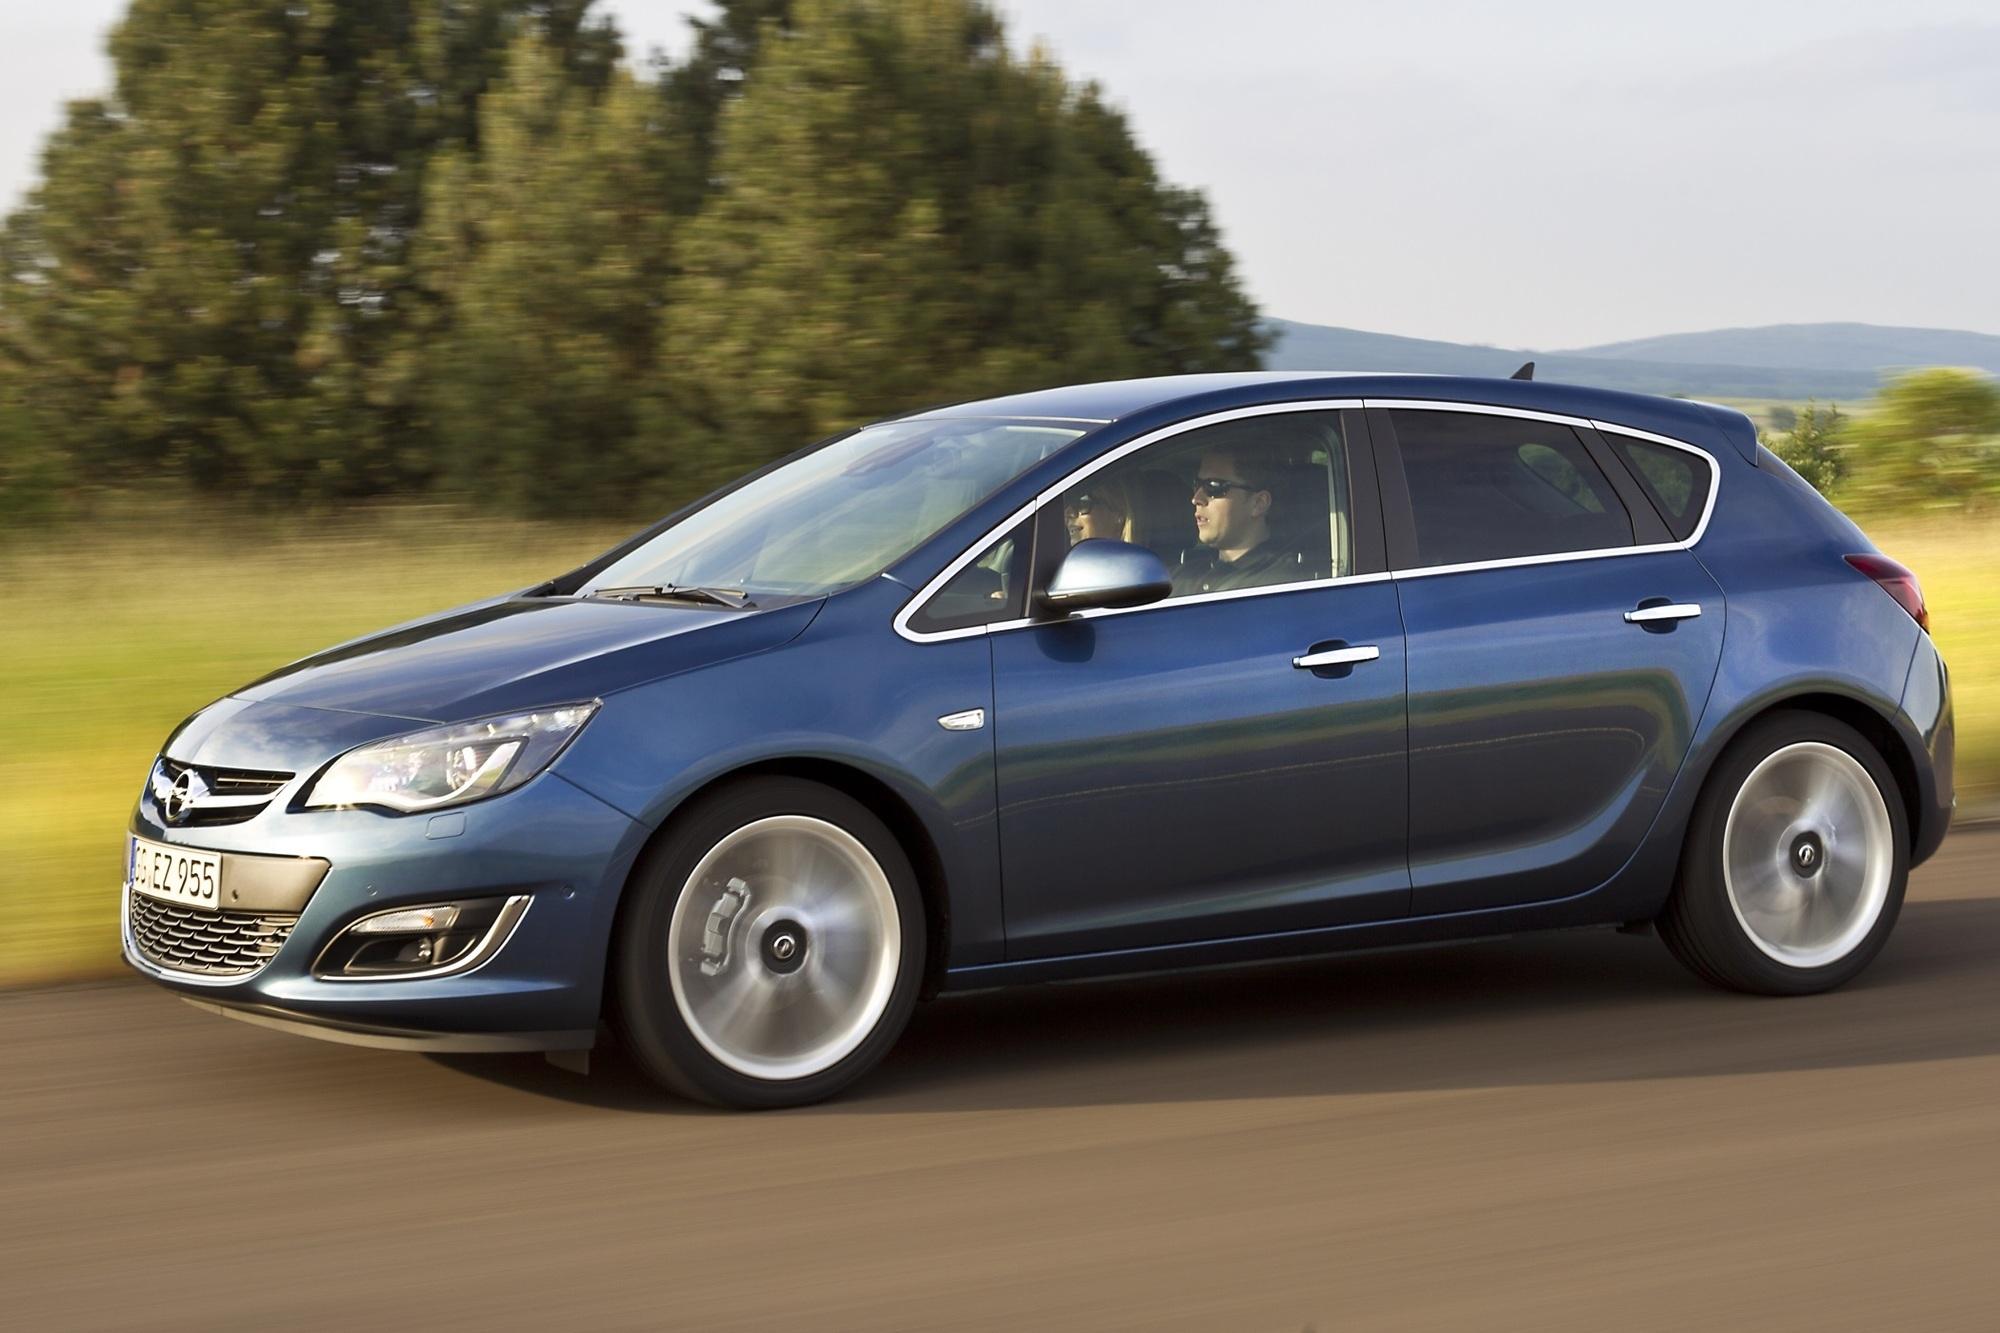 Test: Opel Astra 1.6 CDTI - Alltägliche Vernunft